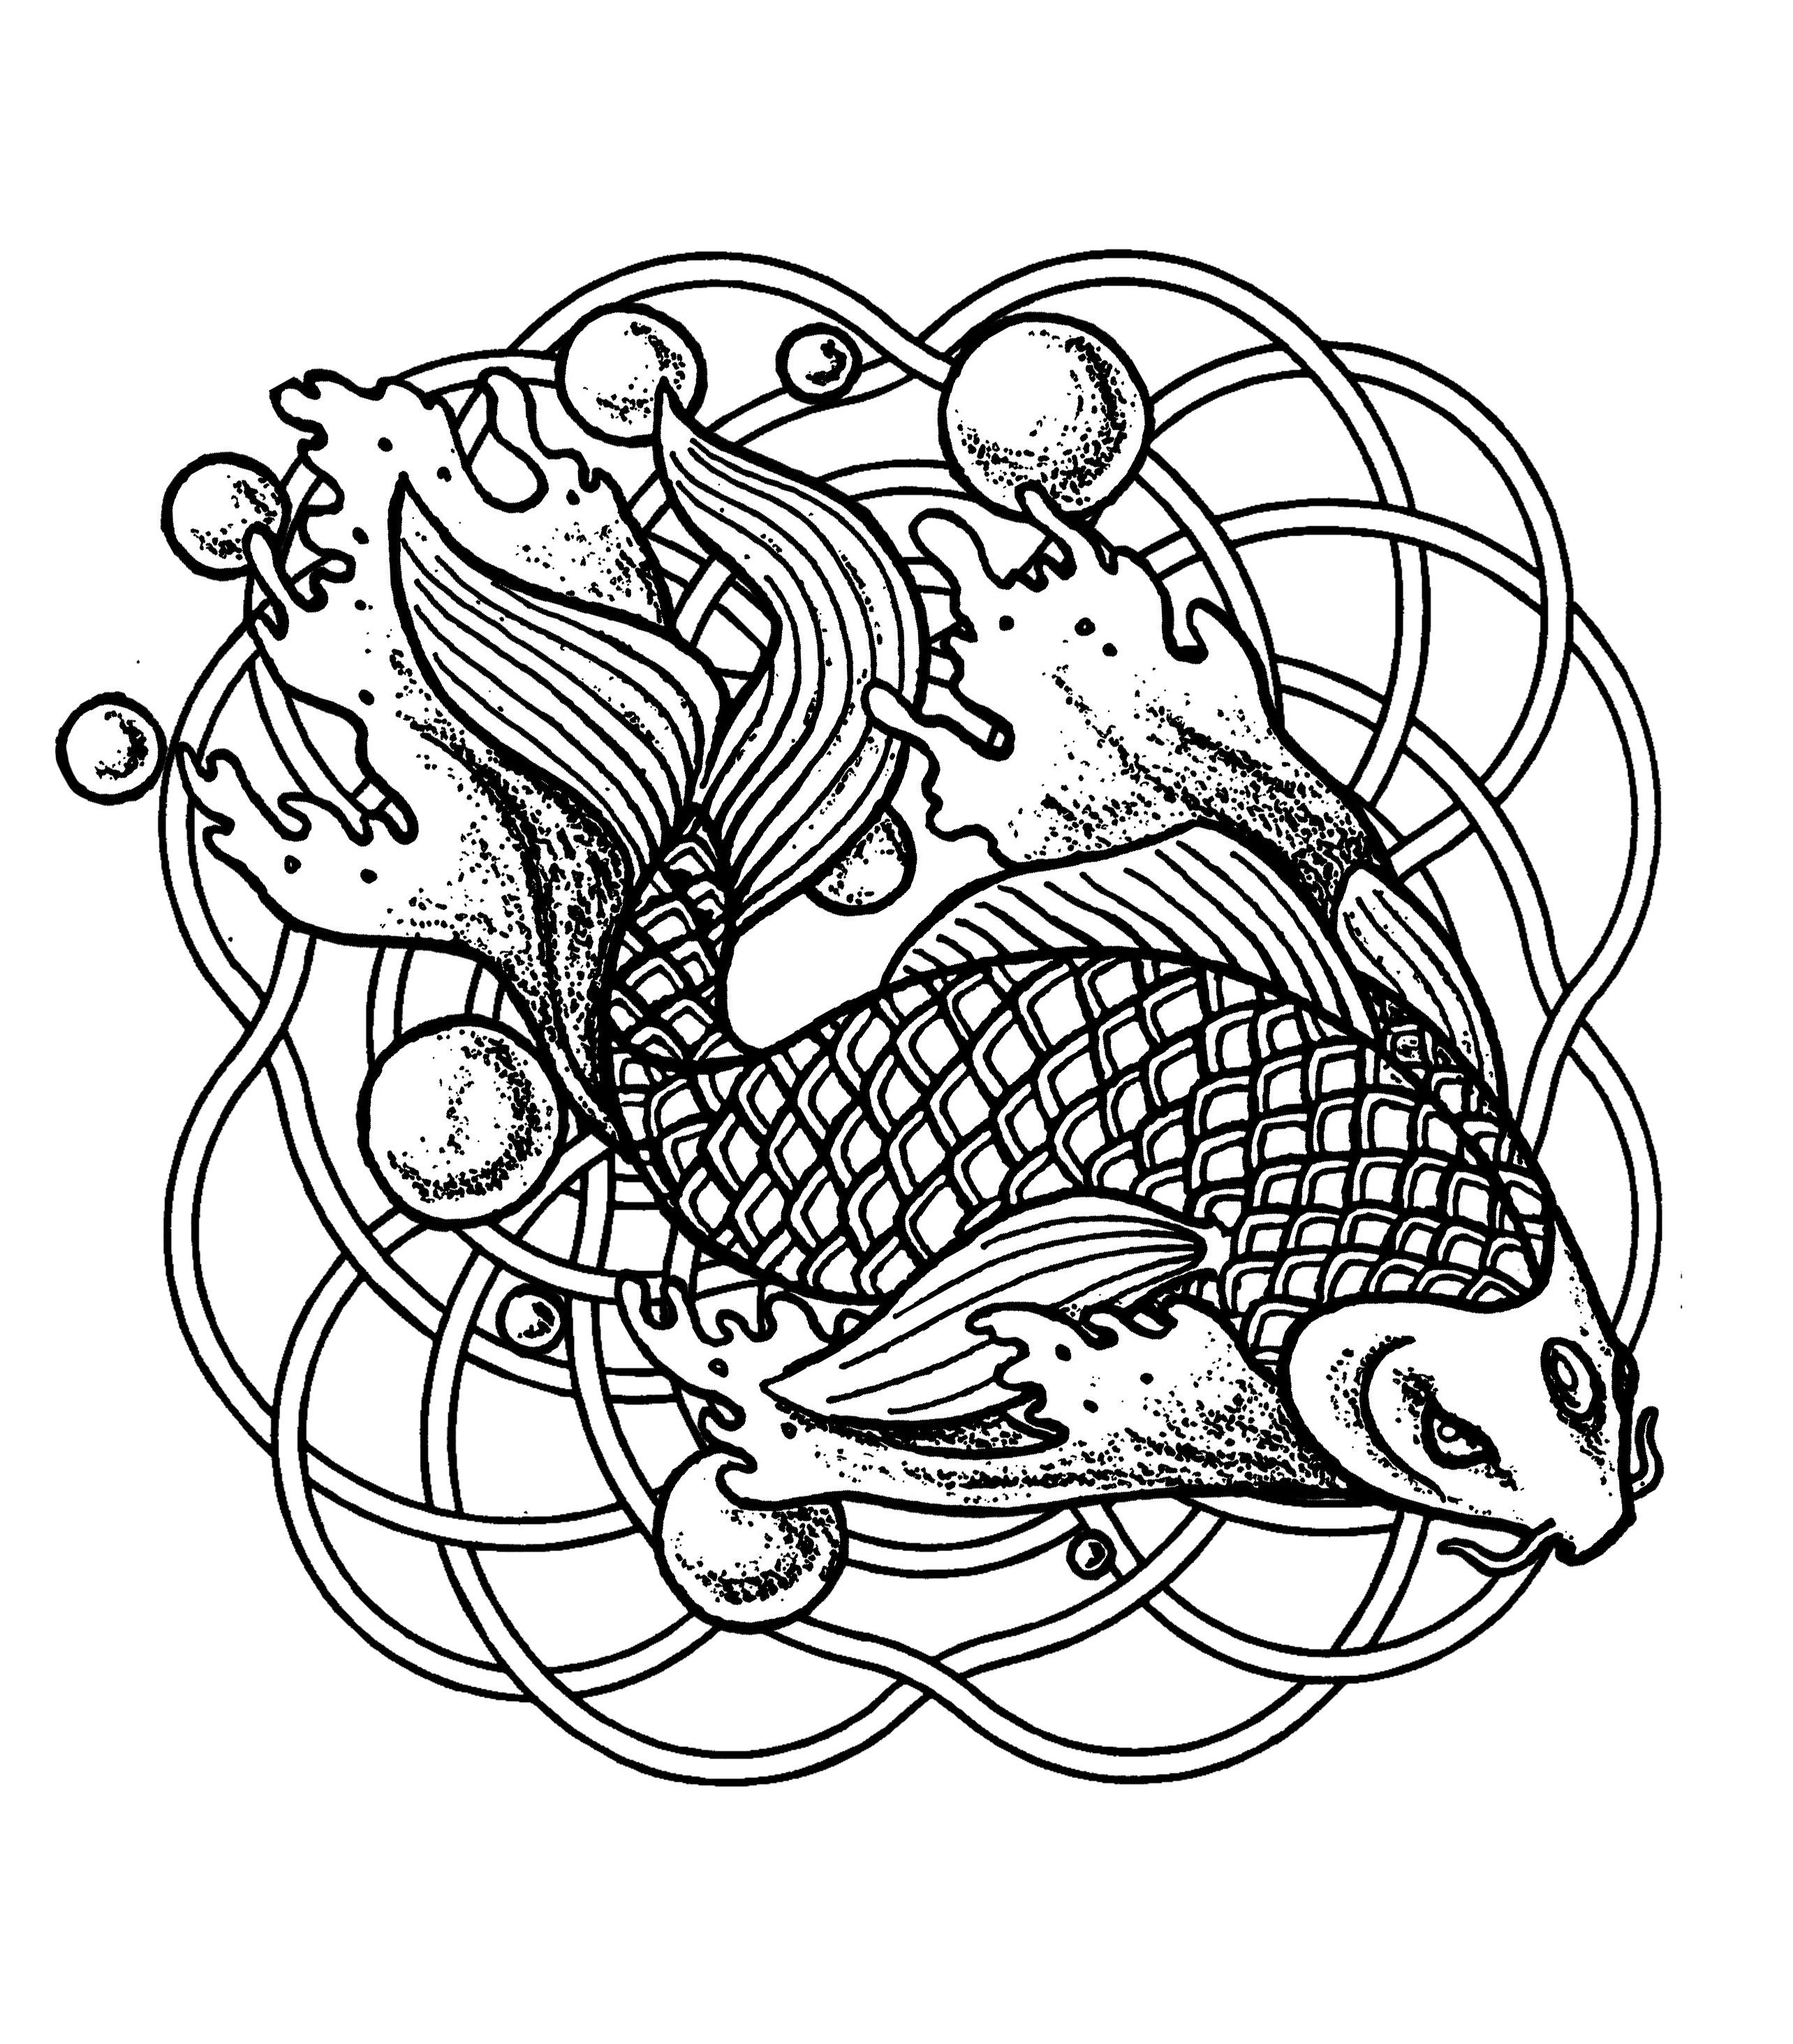 Mandala Fish And Bubles Mandalas Coloring Pages For Adults